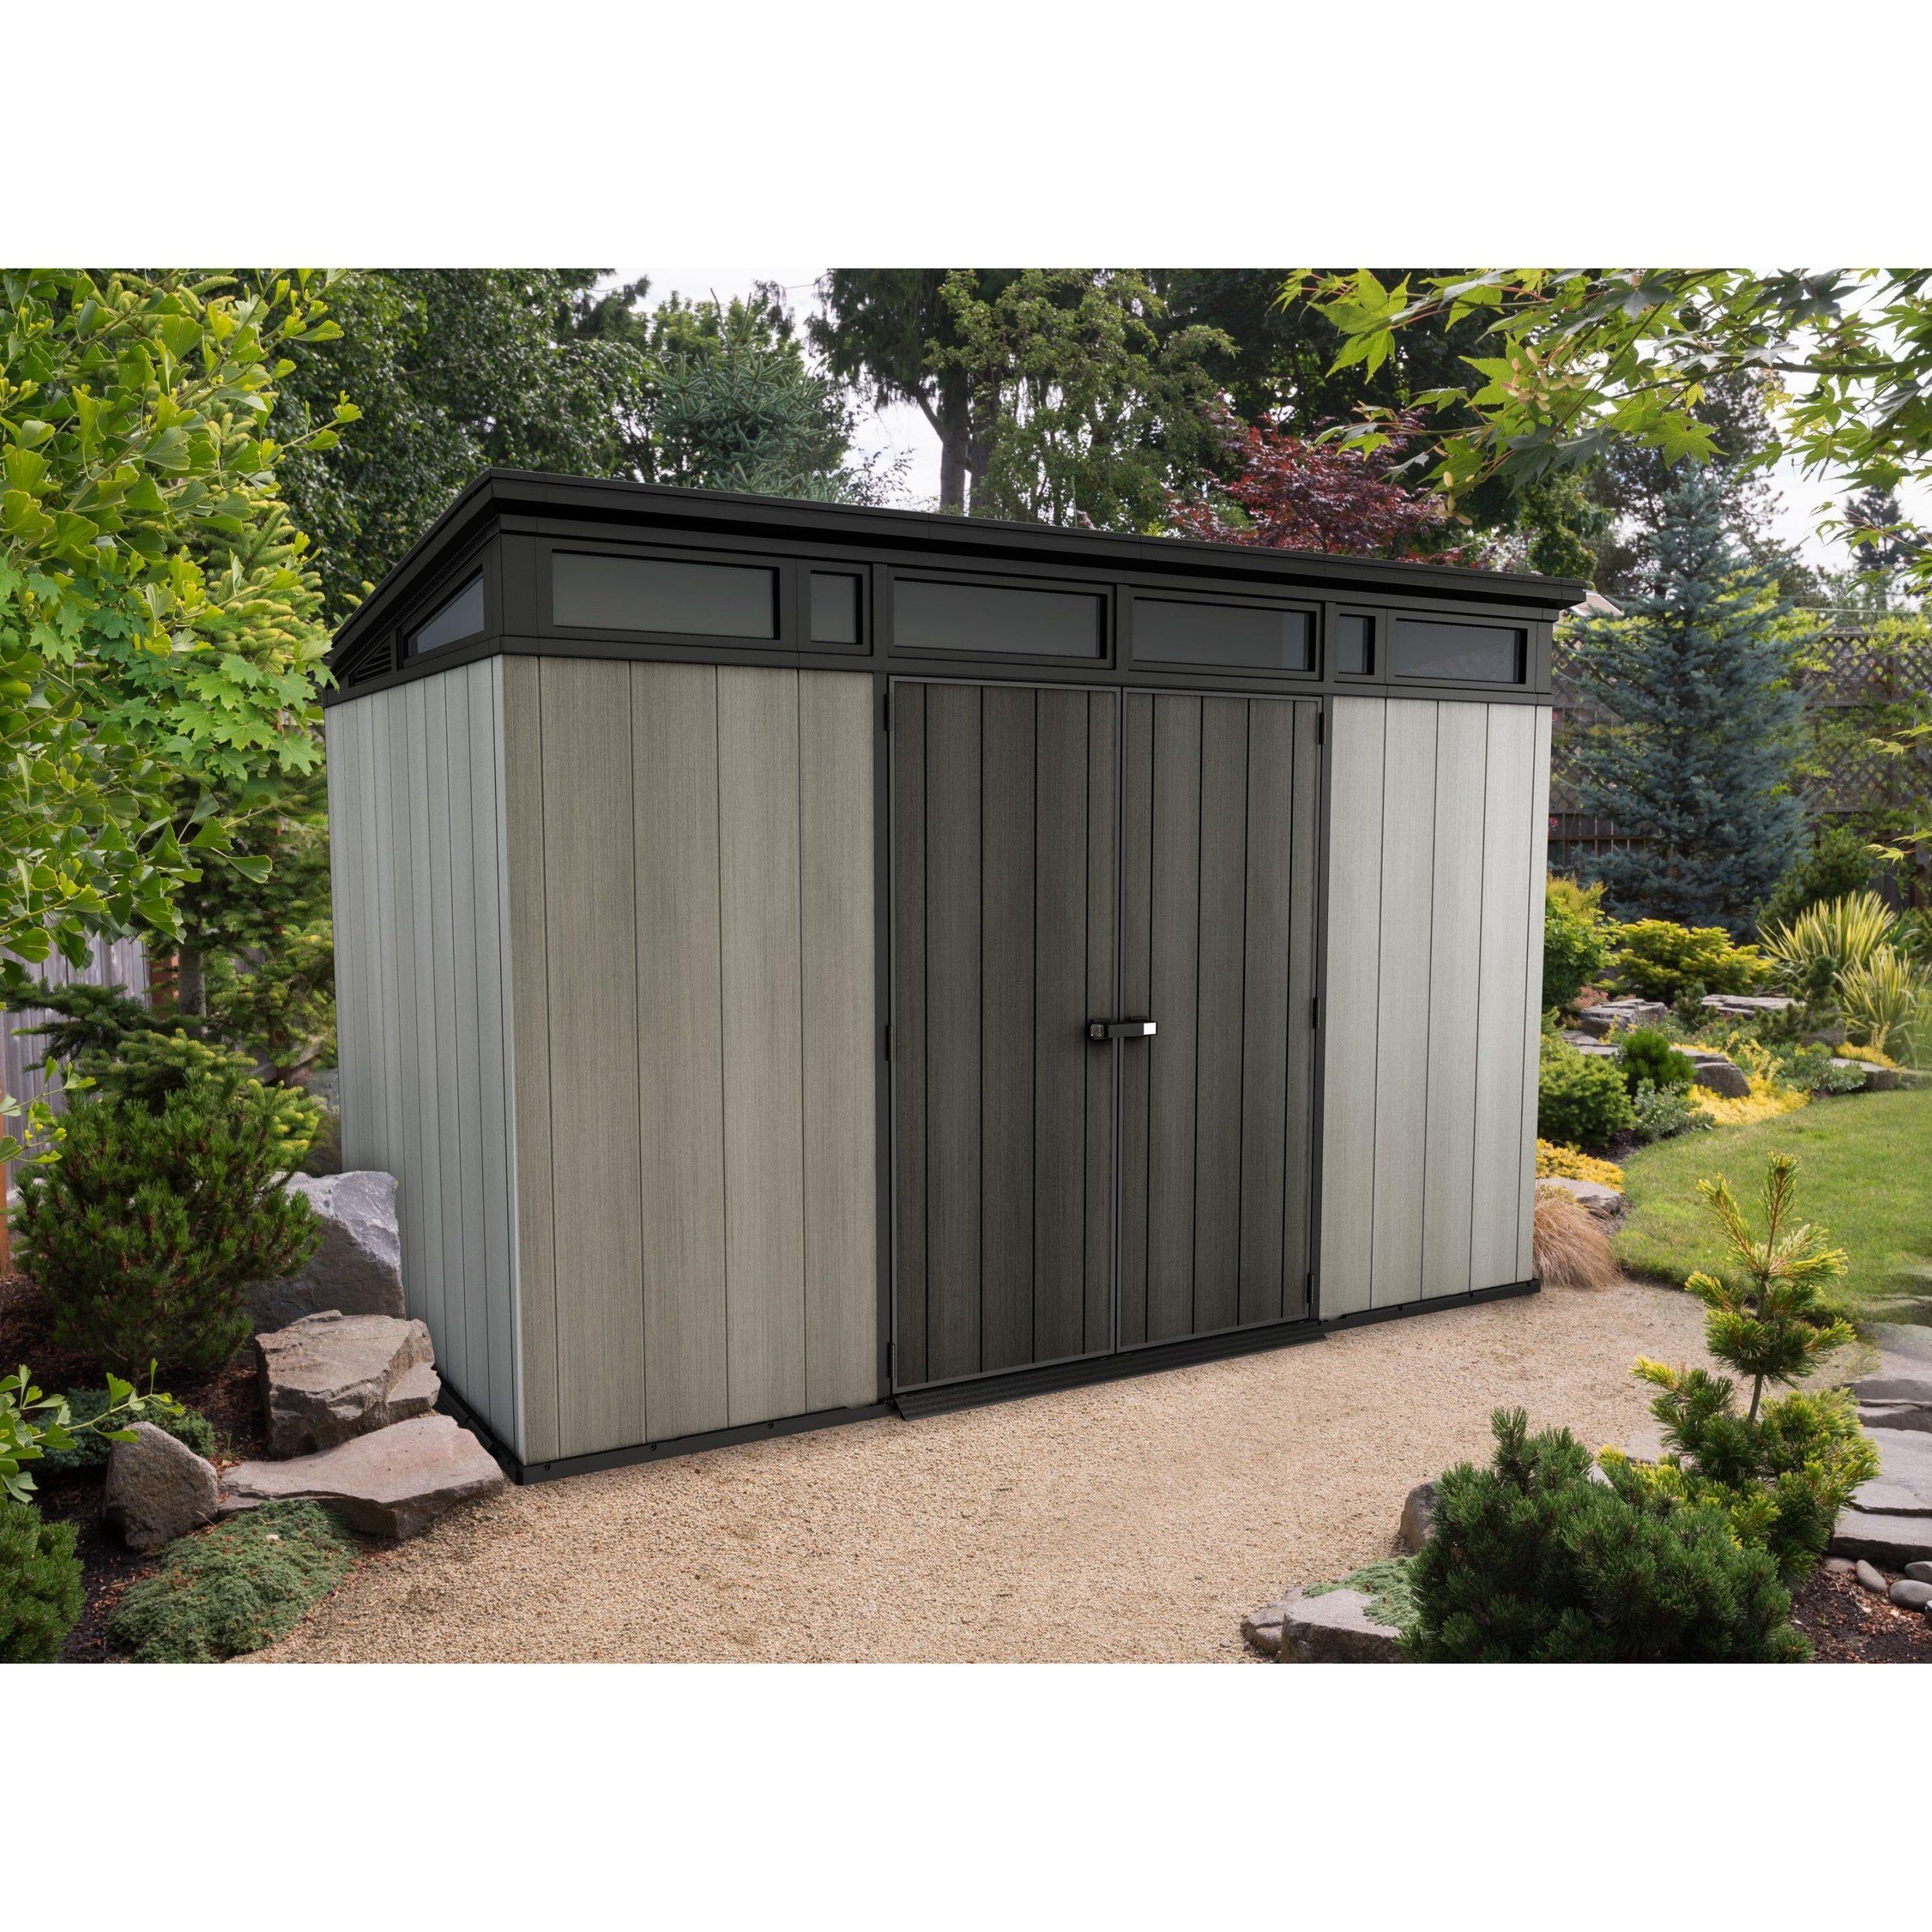 Abri De Jardin Résine Artisan 117 Ep.20 Mm, 6.57 M² Keter ... encequiconcerne Abri De Jardin Super U